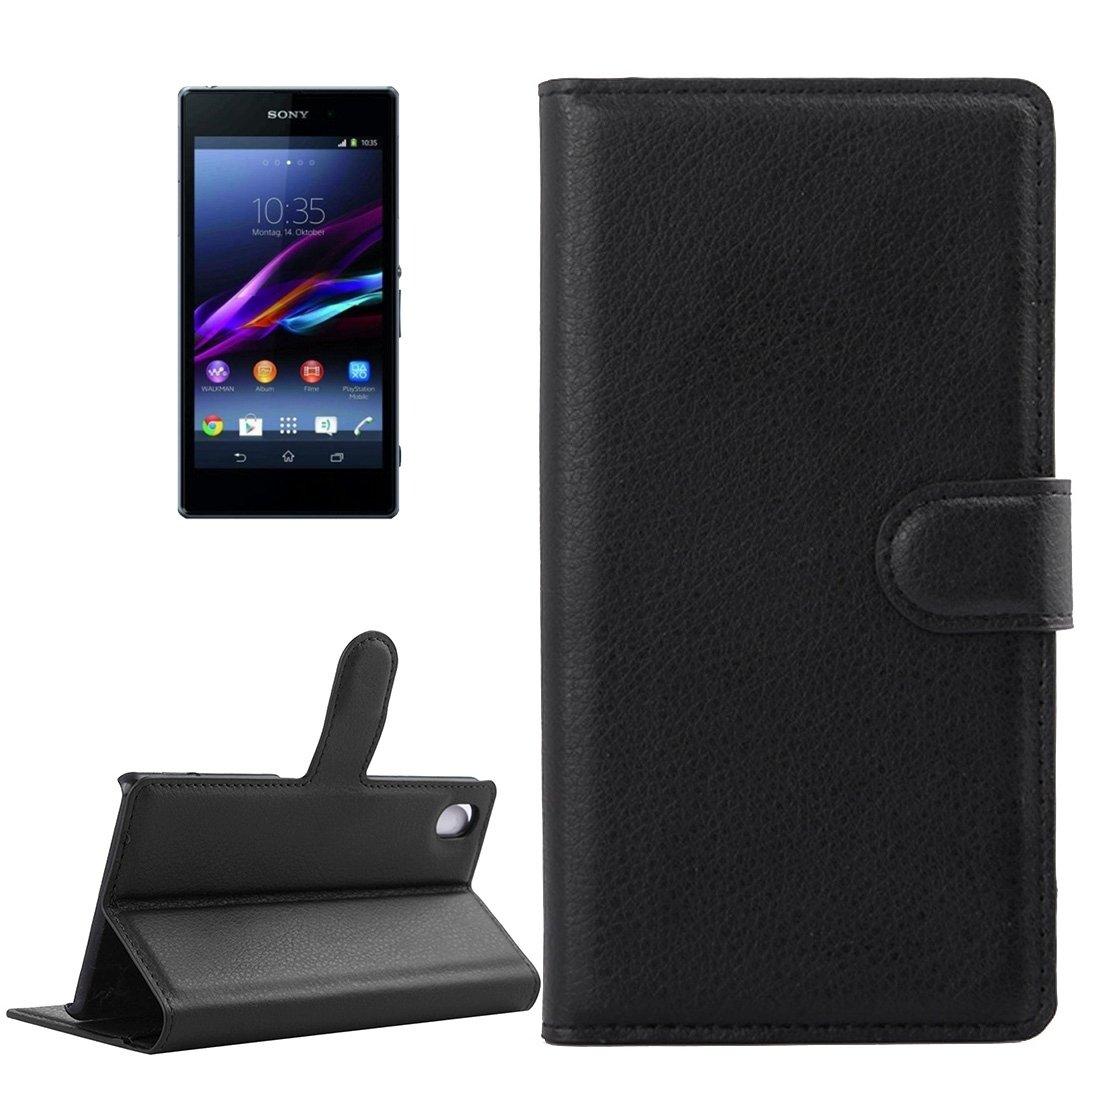 Premium Phone Case for Sony Xperia Z1 / L39h